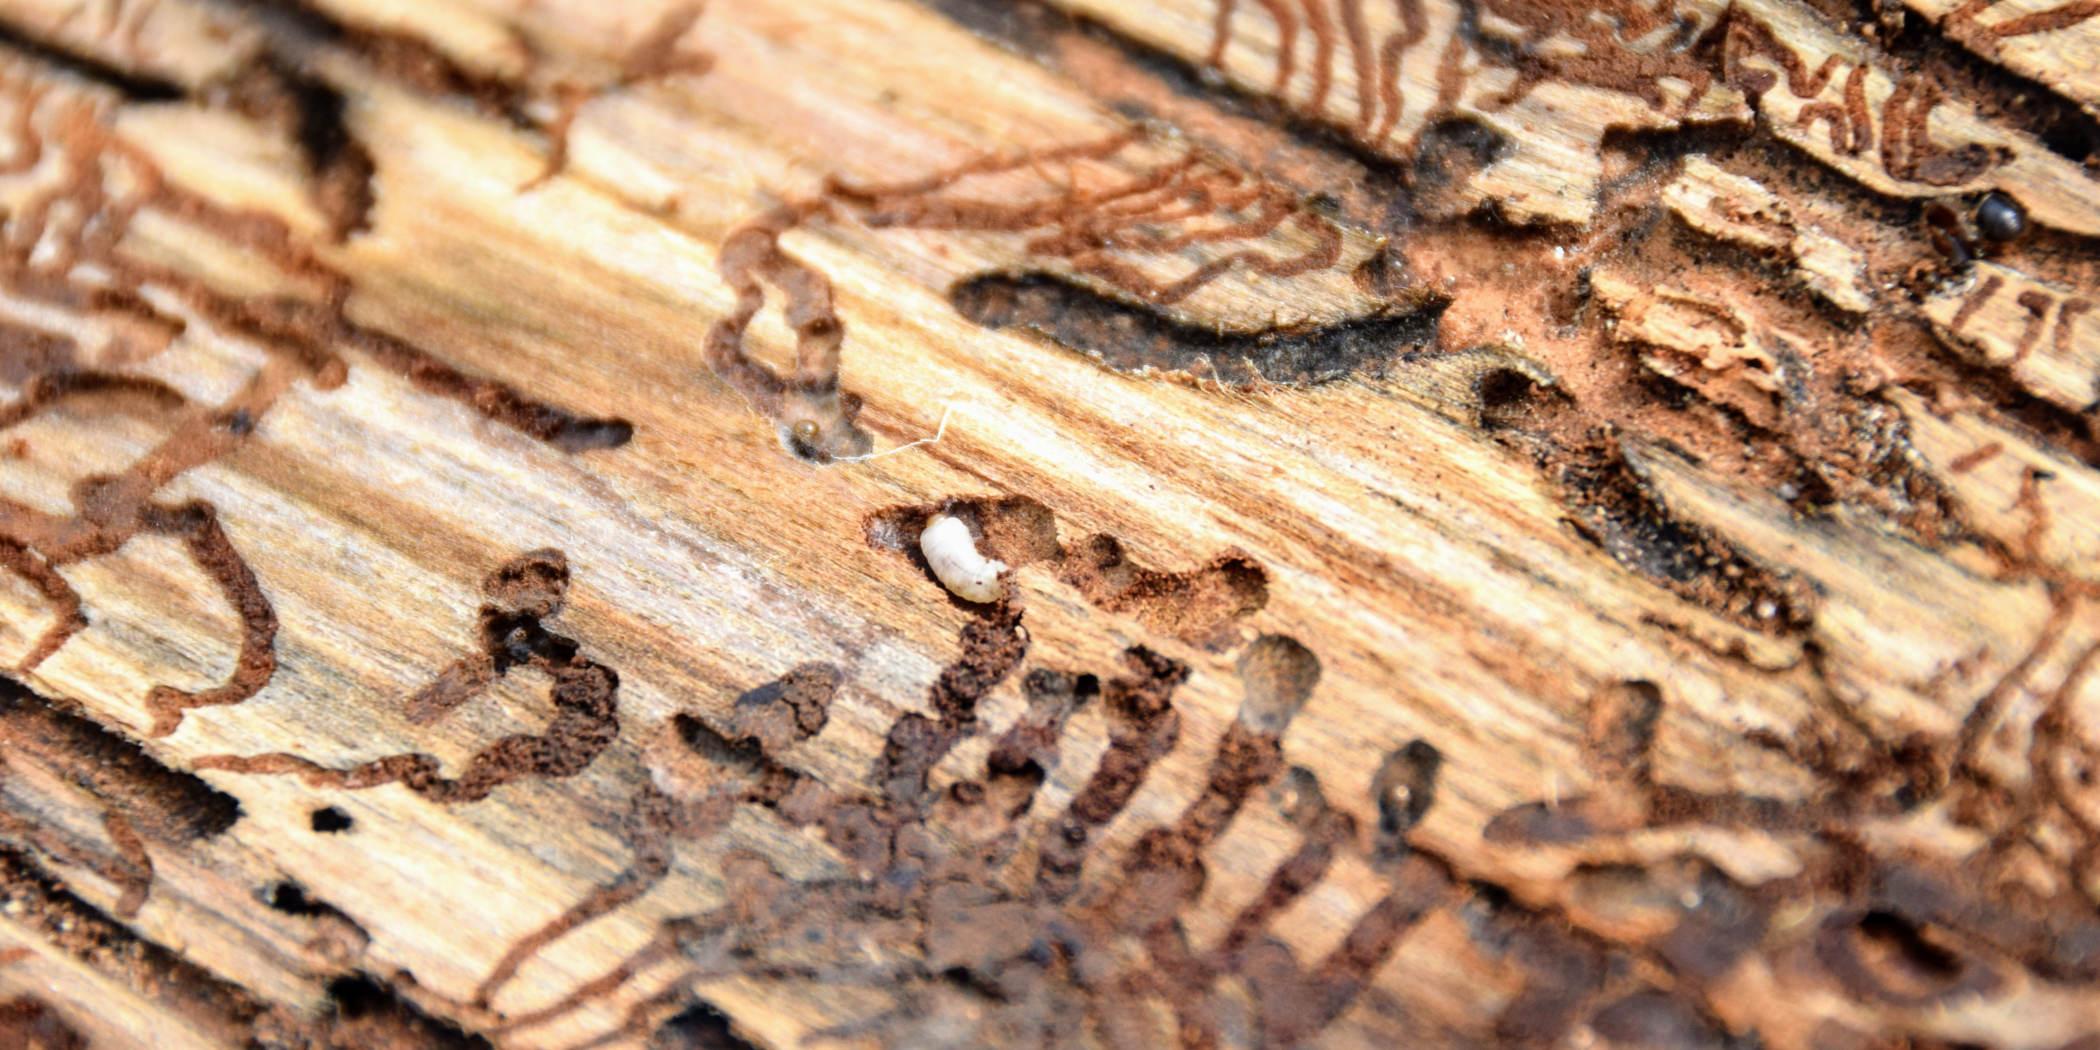 Larva kůrovce na rubu smrkové kůry